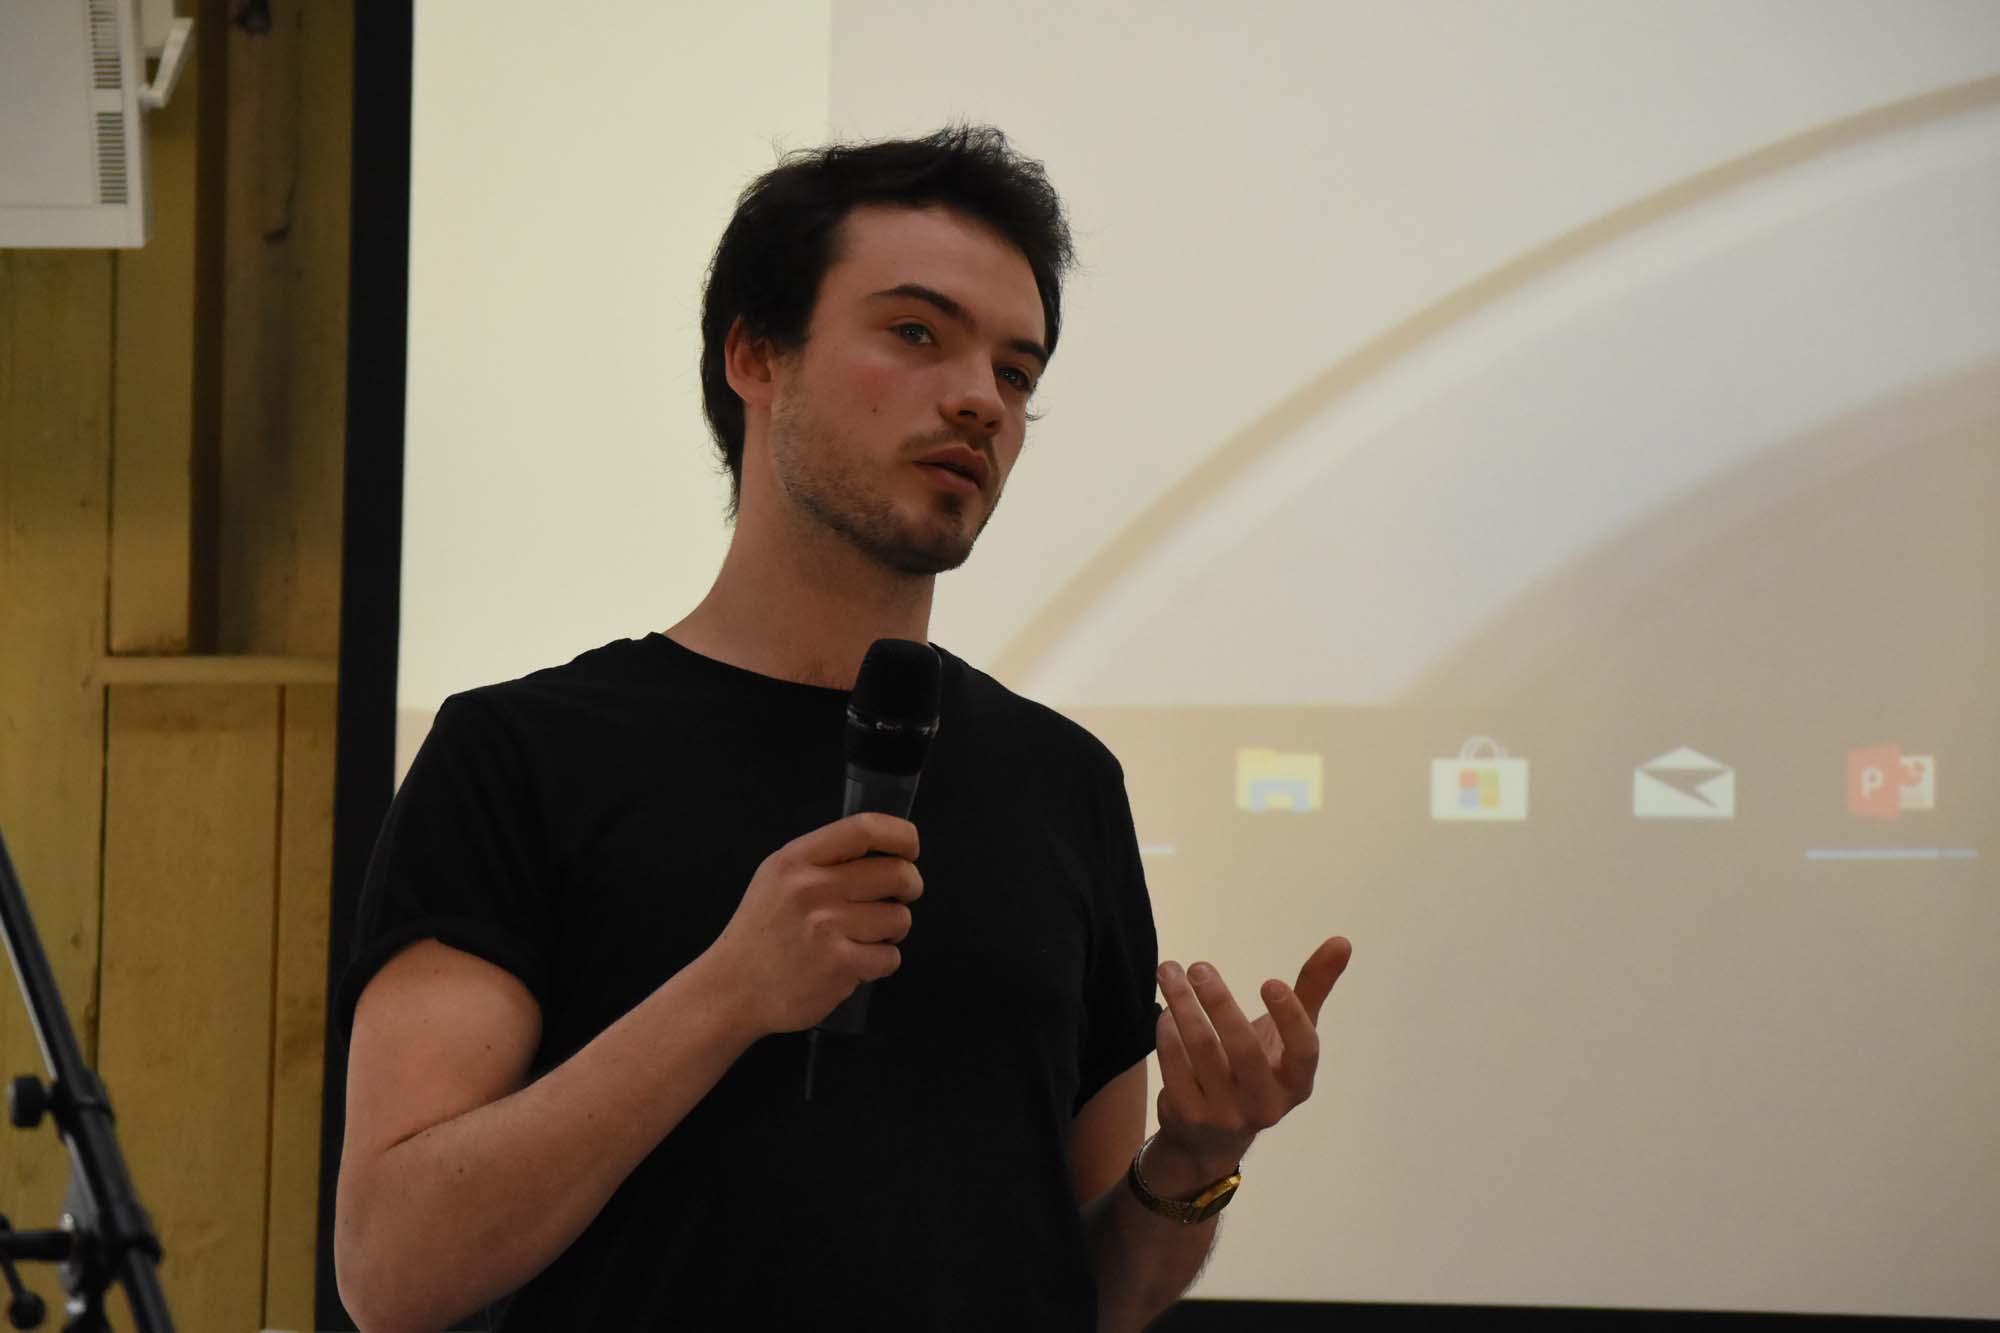 Olivier Brückner spricht über sein Start-up blokdots